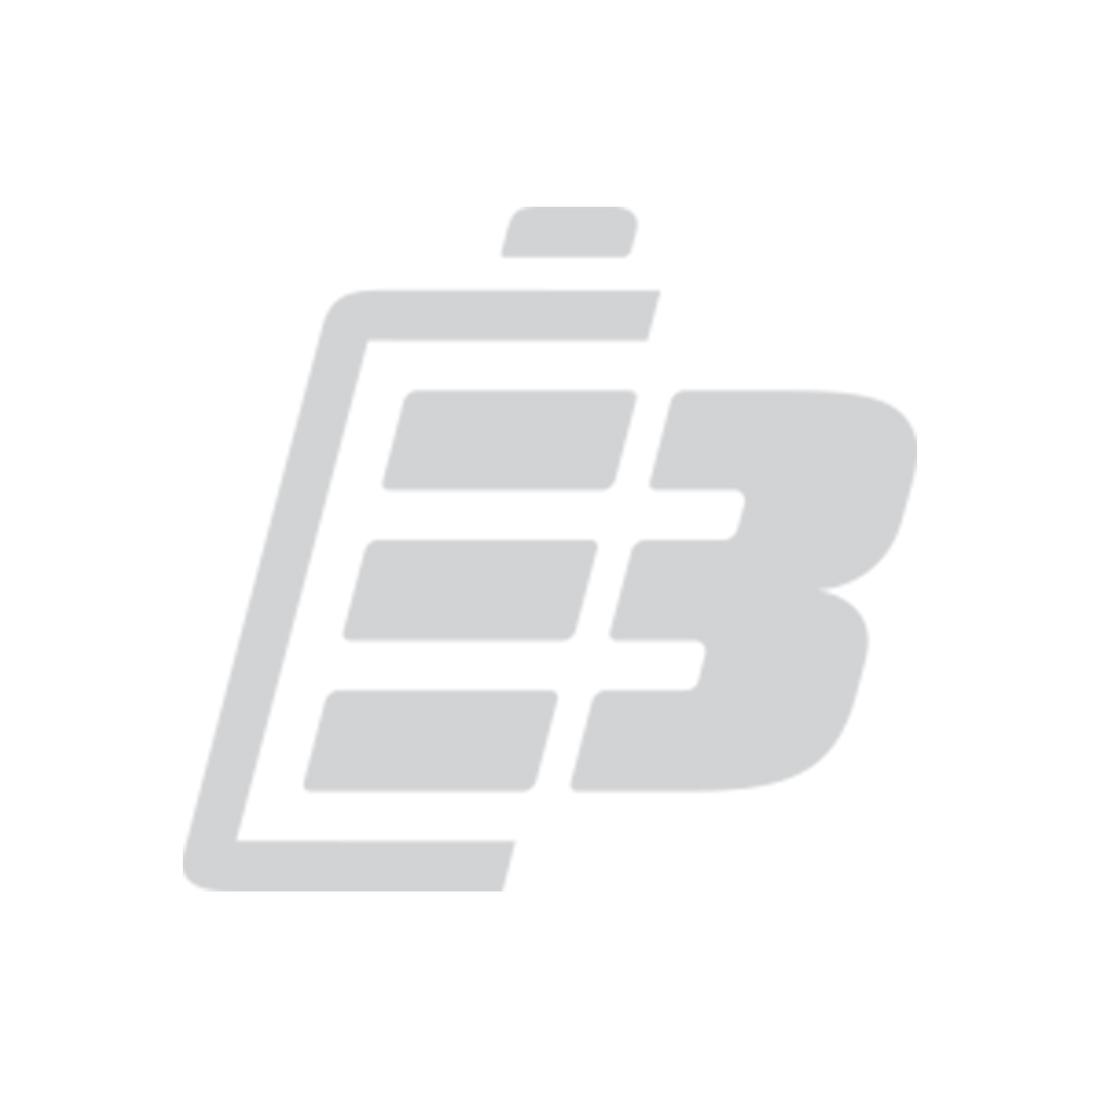 HP Mini 110-3001xx Notebook Webcam Driver Download